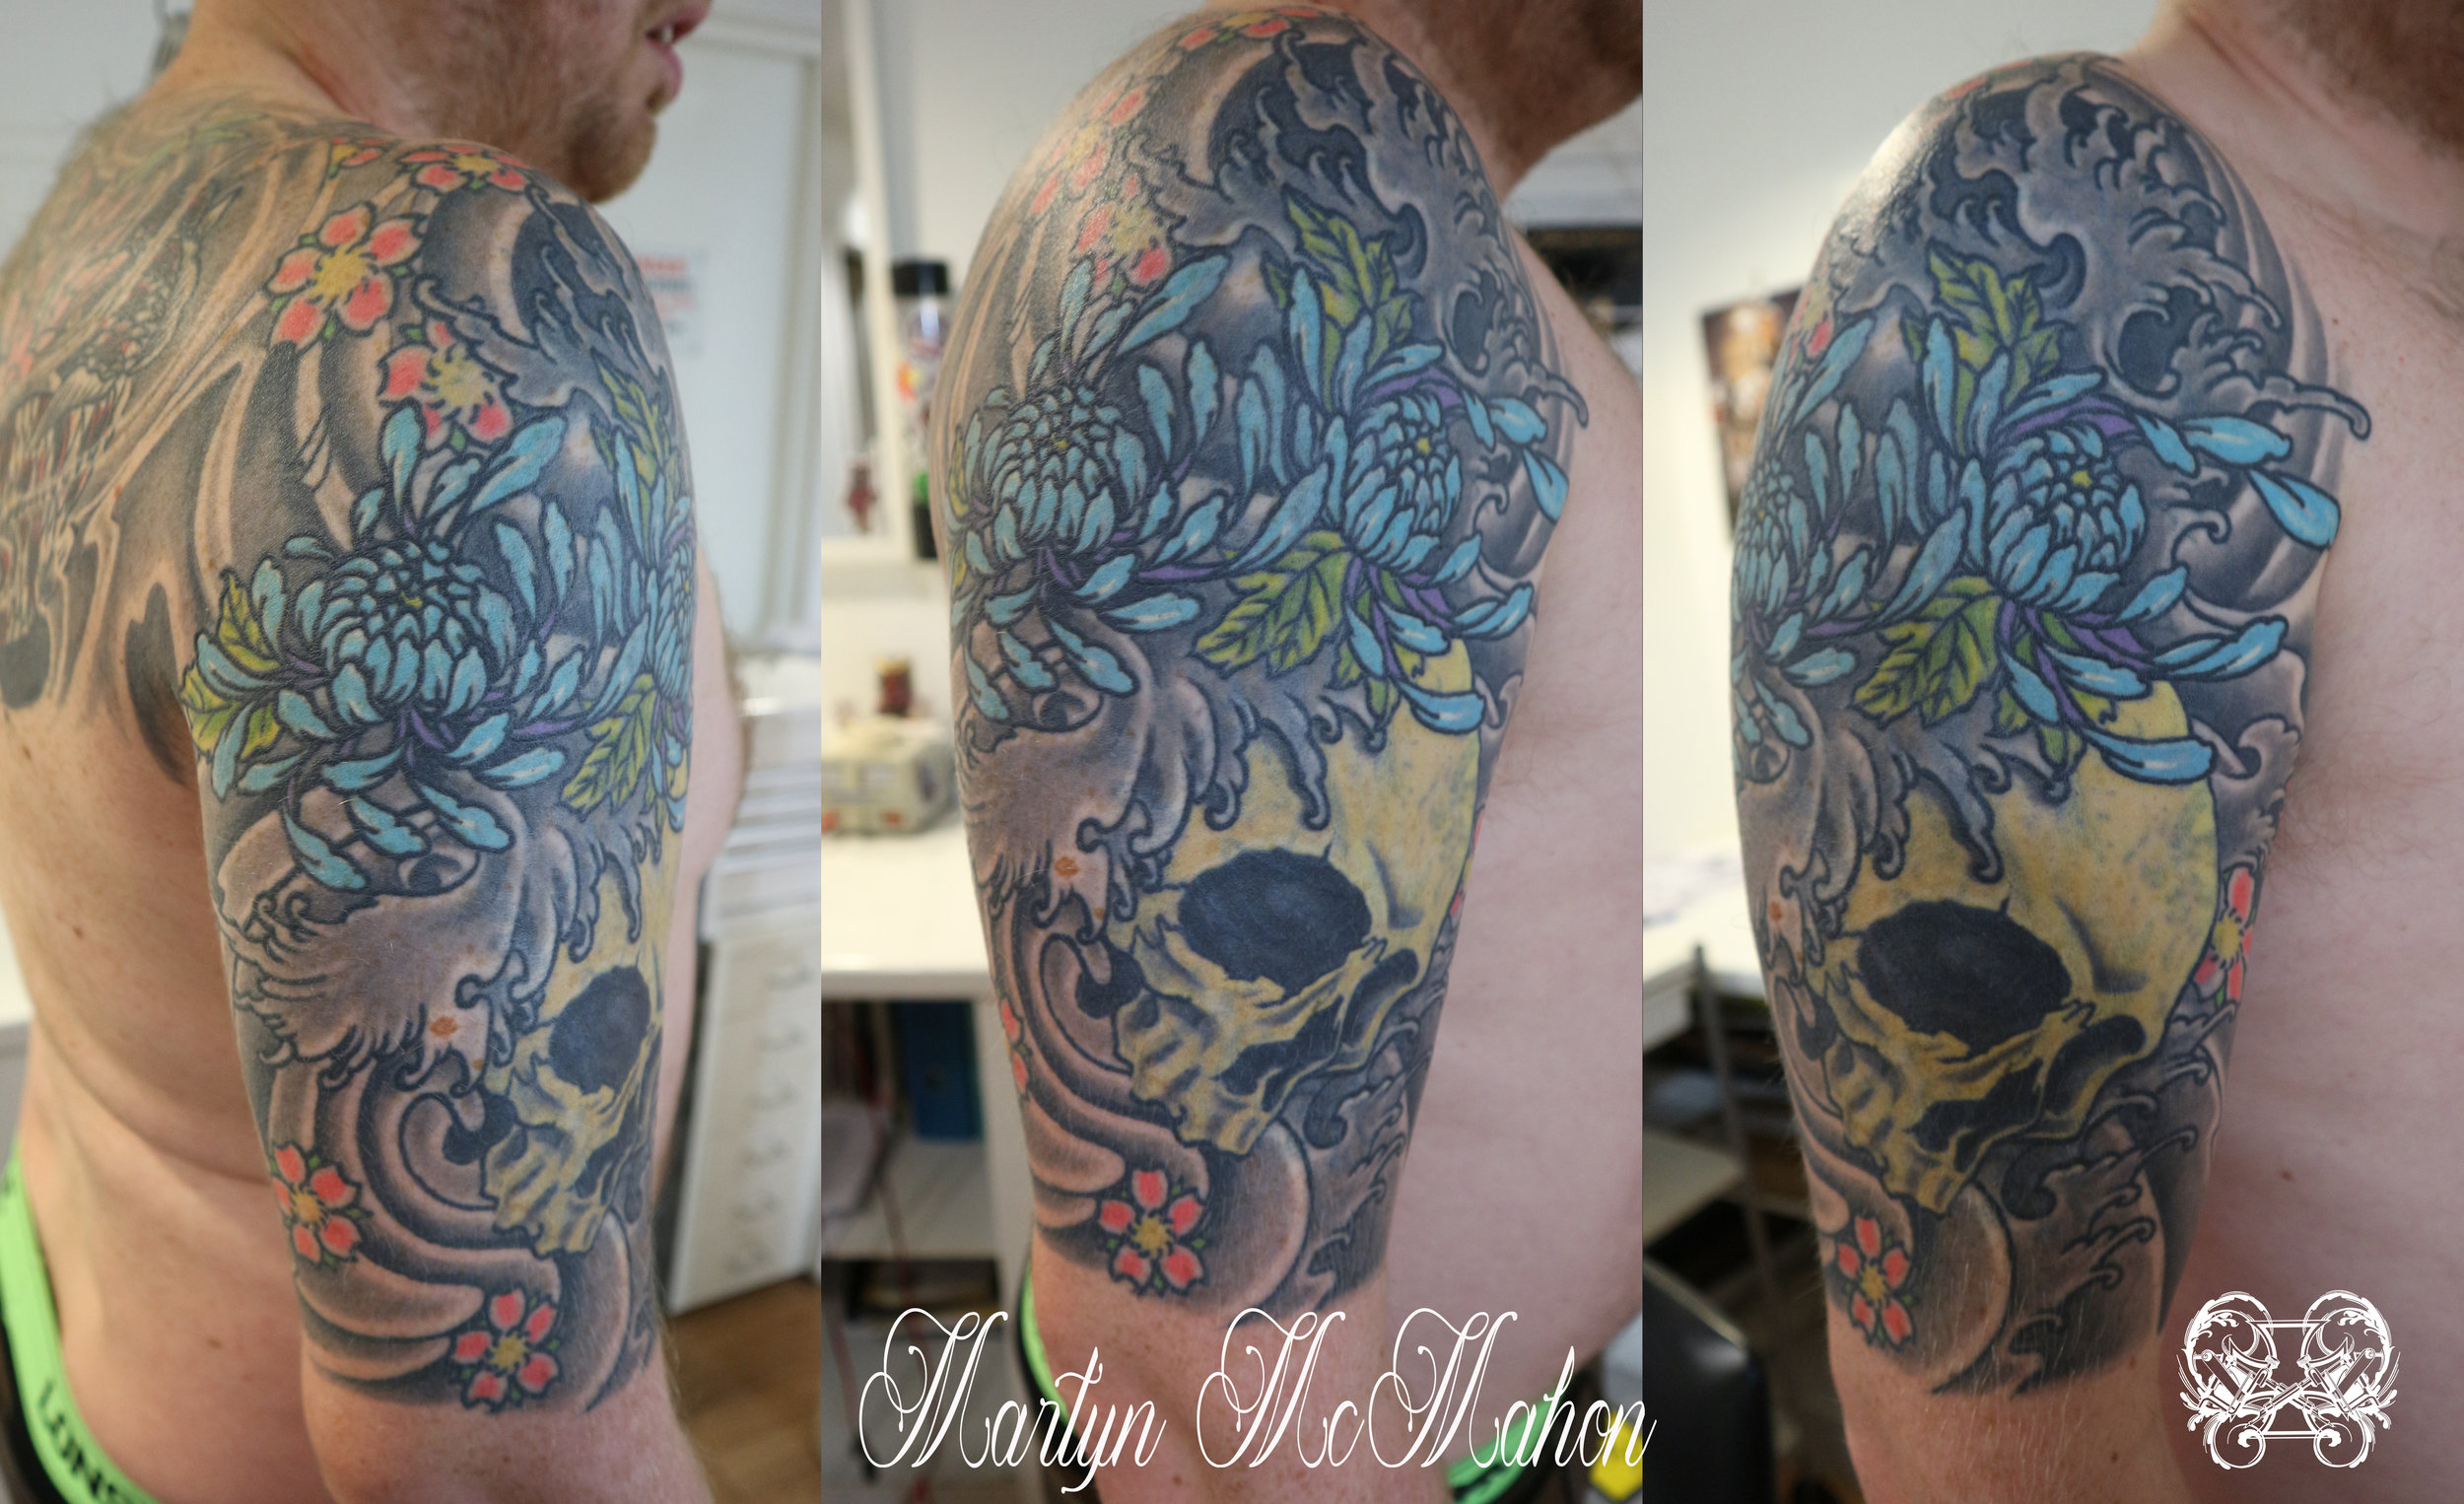 Martyn - skull chrysanthemum triptych.jpg